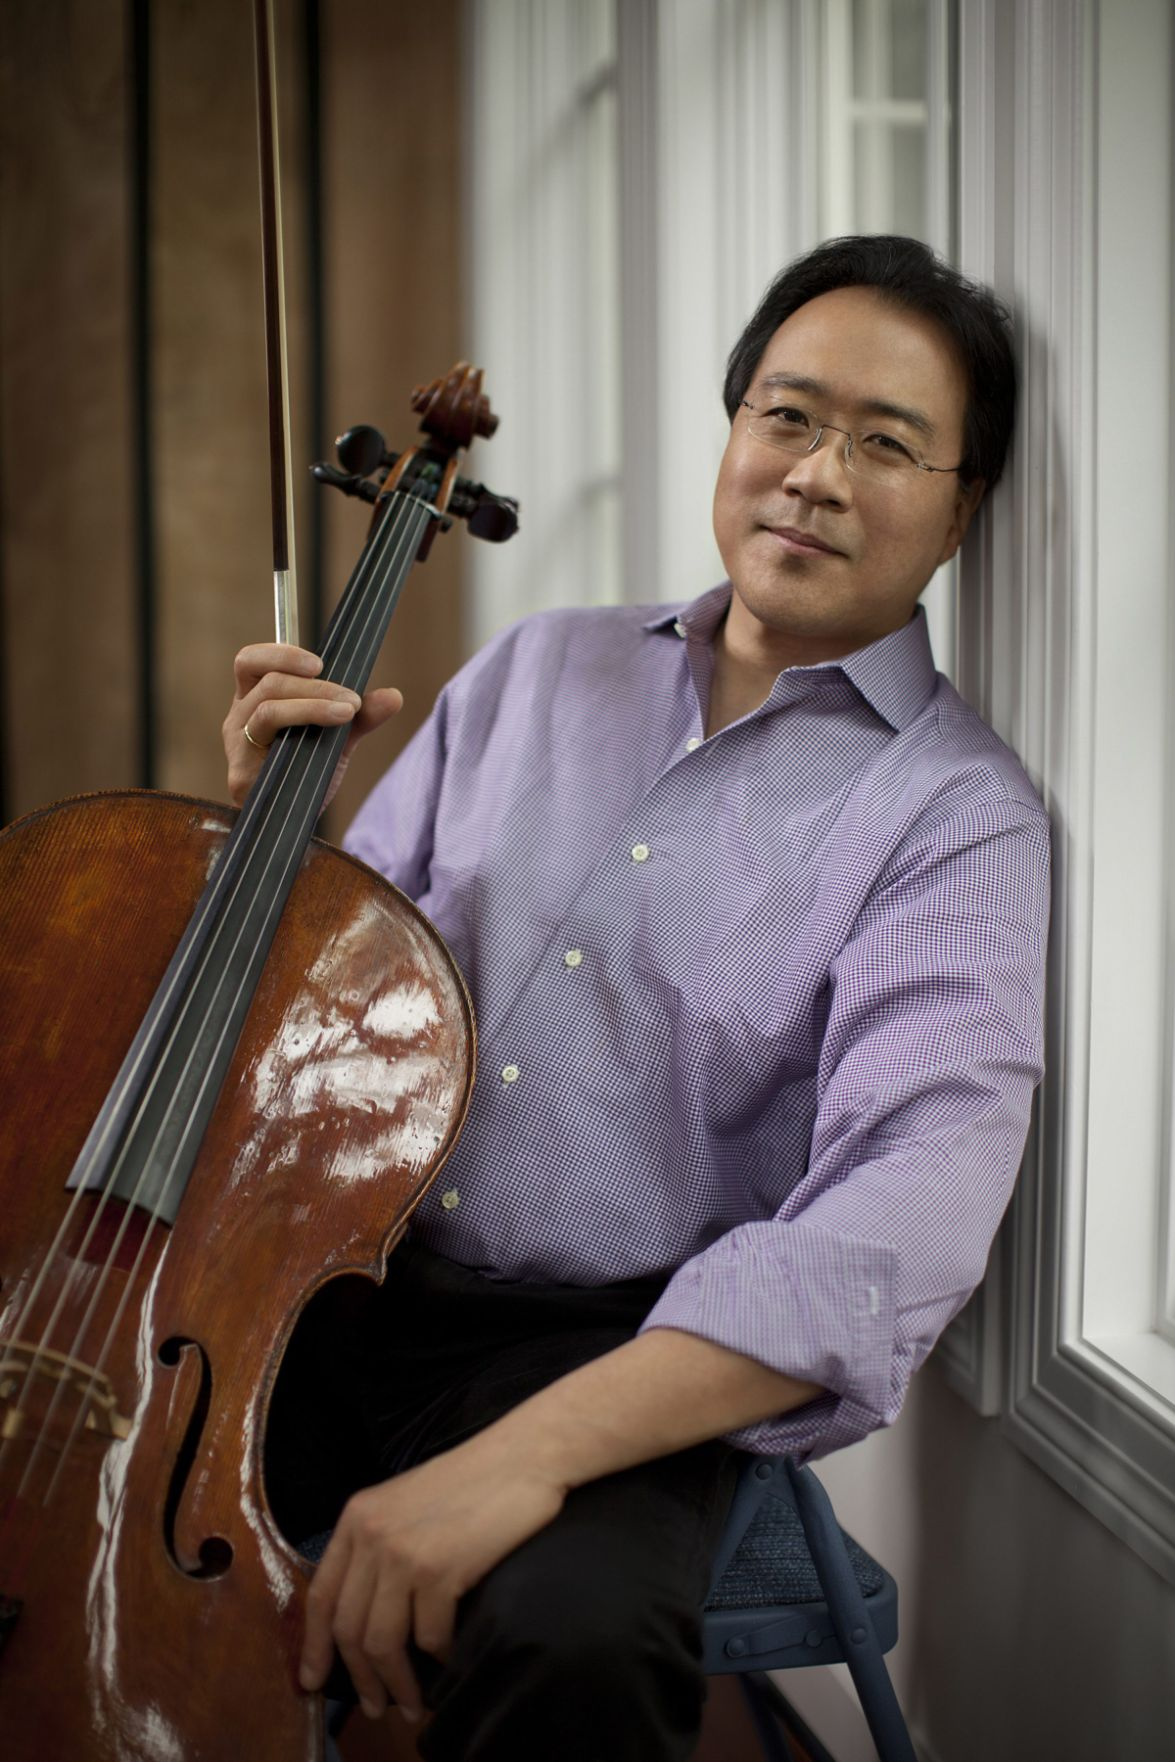 Superstar cellist Yo-Yo Ma to play in Waco   Music   wacotrib com